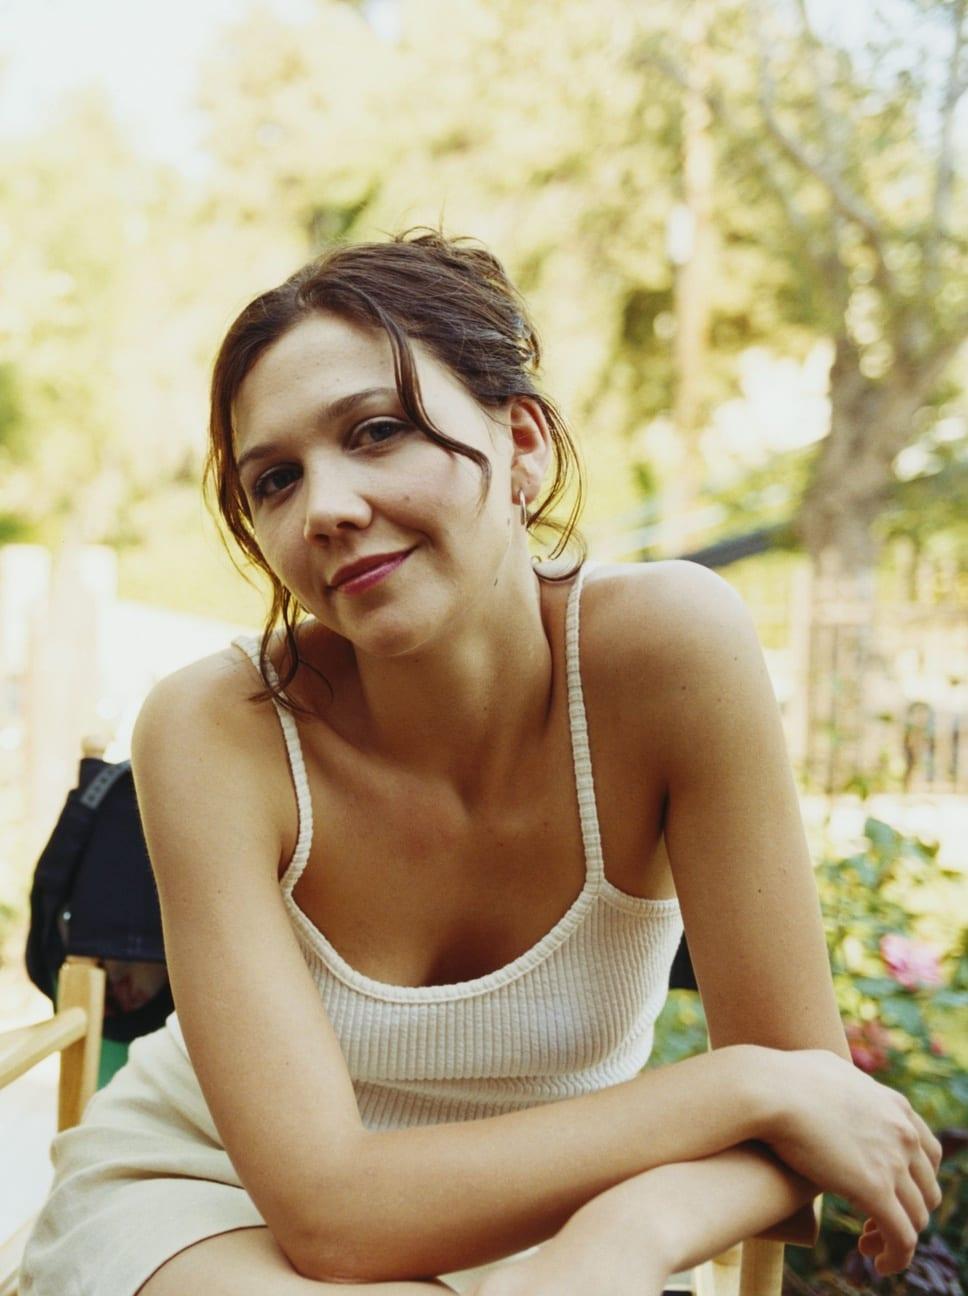 Maggie gyllenhaal naked full frontal hd 4